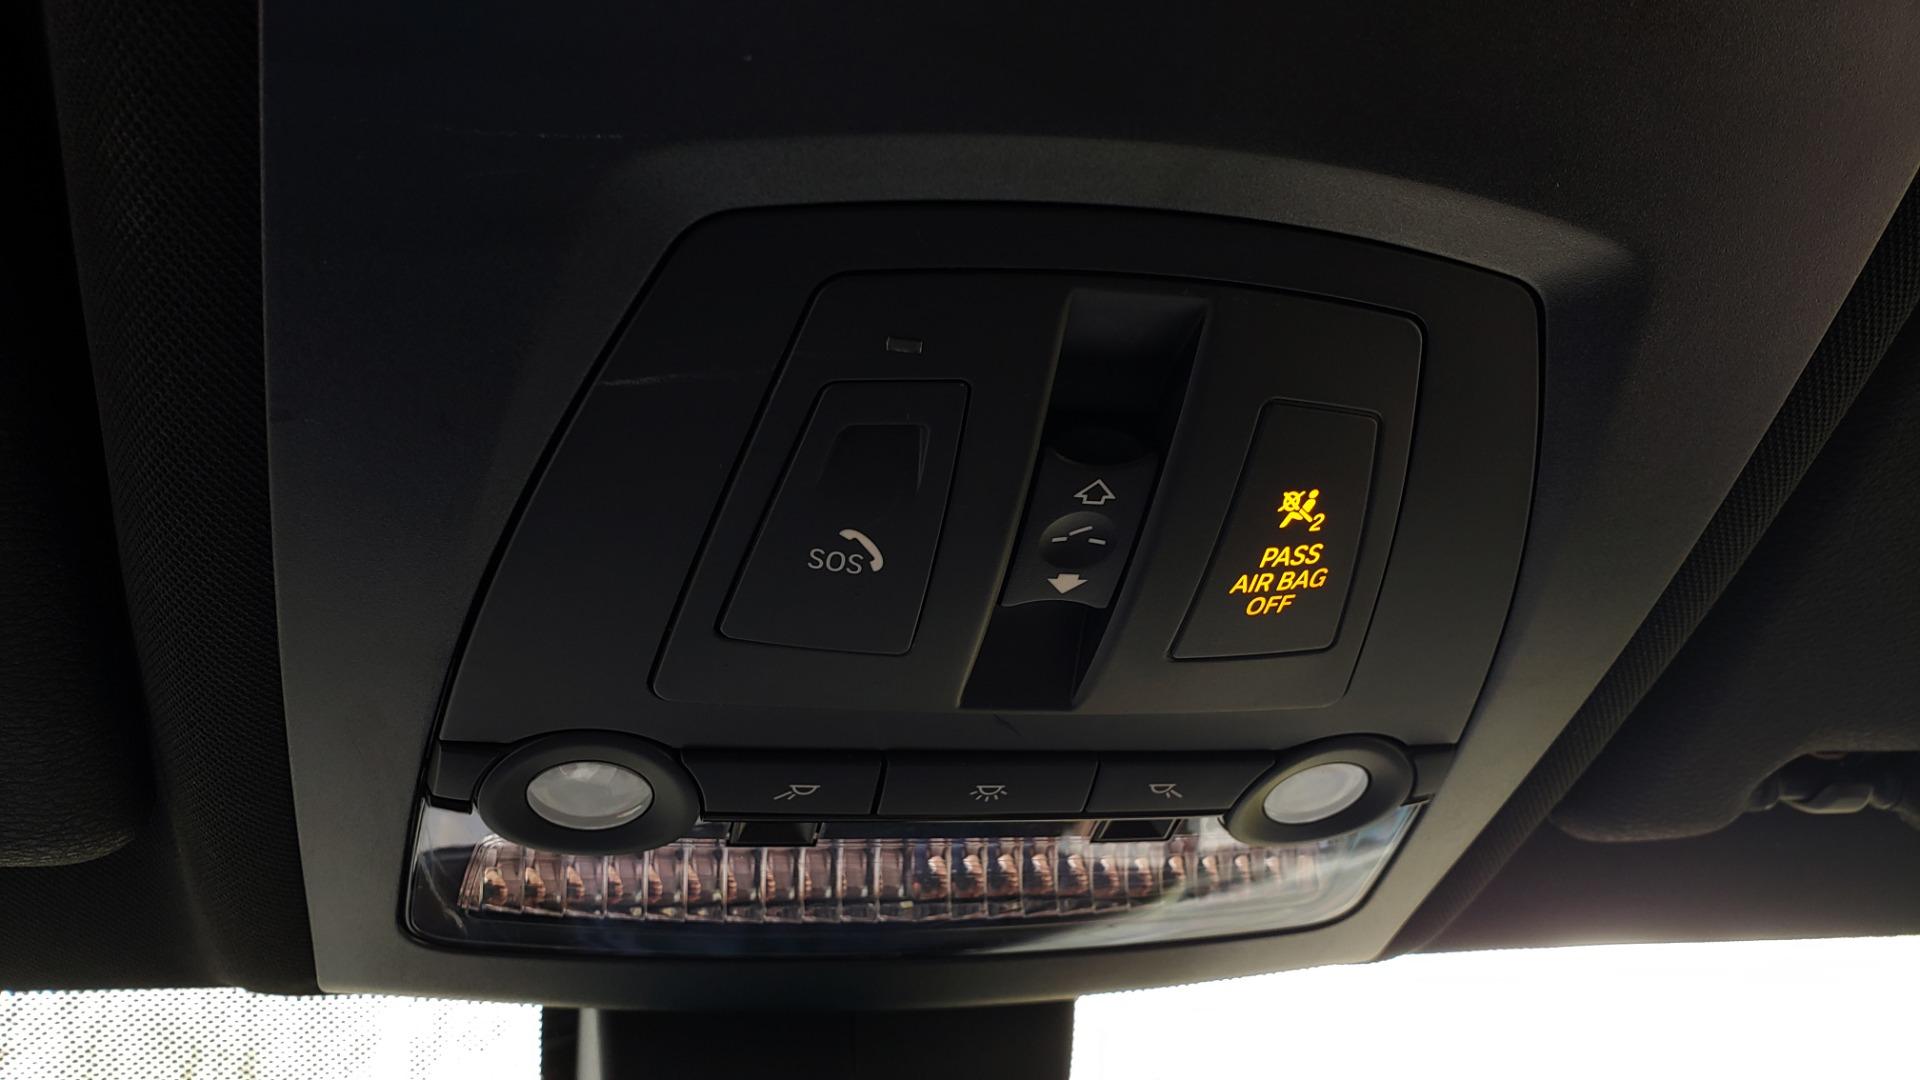 Used 2017 BMW X3 XDRIVE35I M-SPORT / DRVR ASST PLUS / TECHNOLOGY / HUD / BLIND SPOT for sale Sold at Formula Imports in Charlotte NC 28227 55